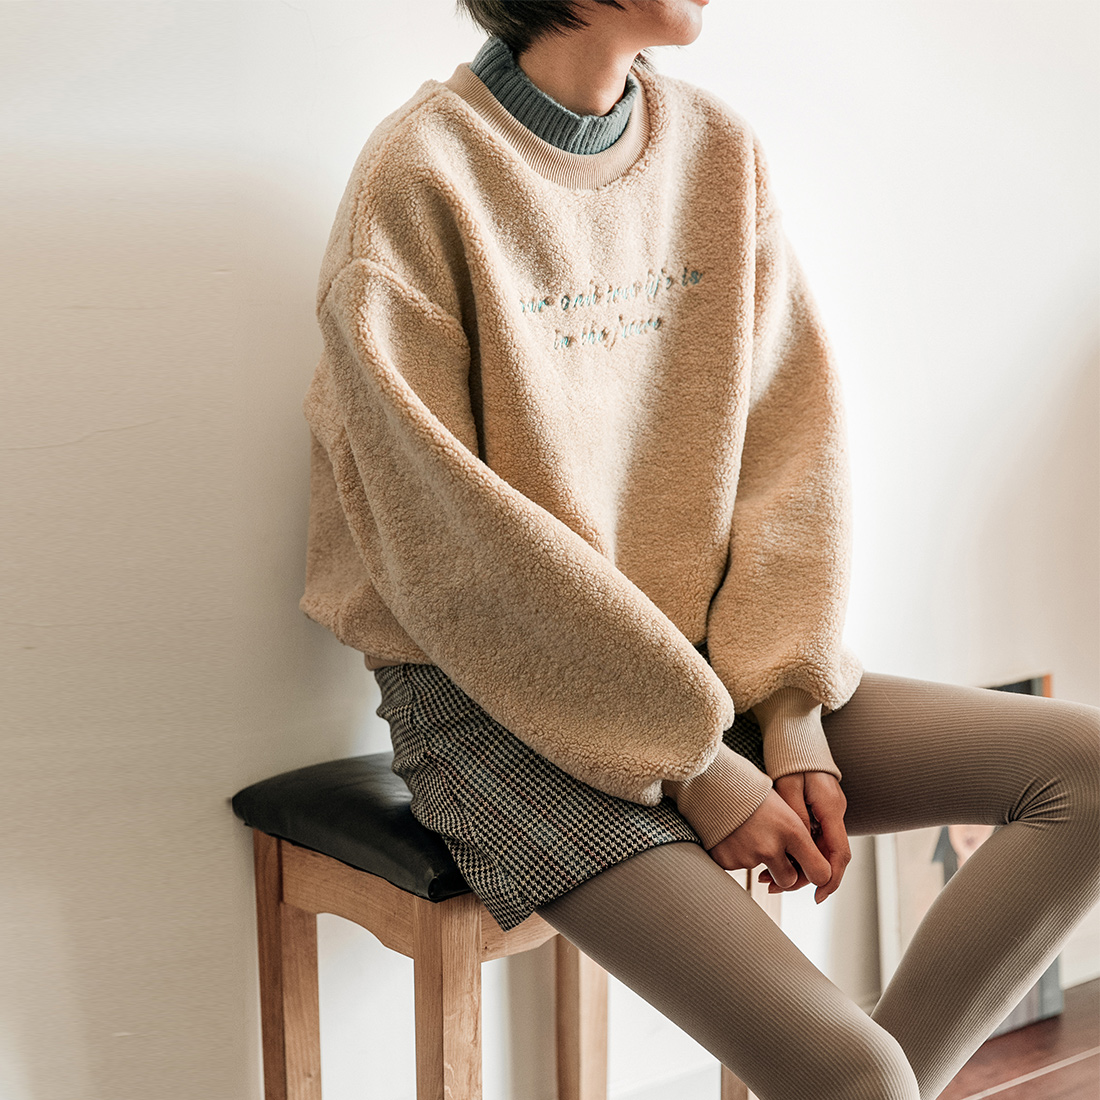 CLOUDSPACE女装字母刺绣撞色拼接套头卫衣女冬V9366